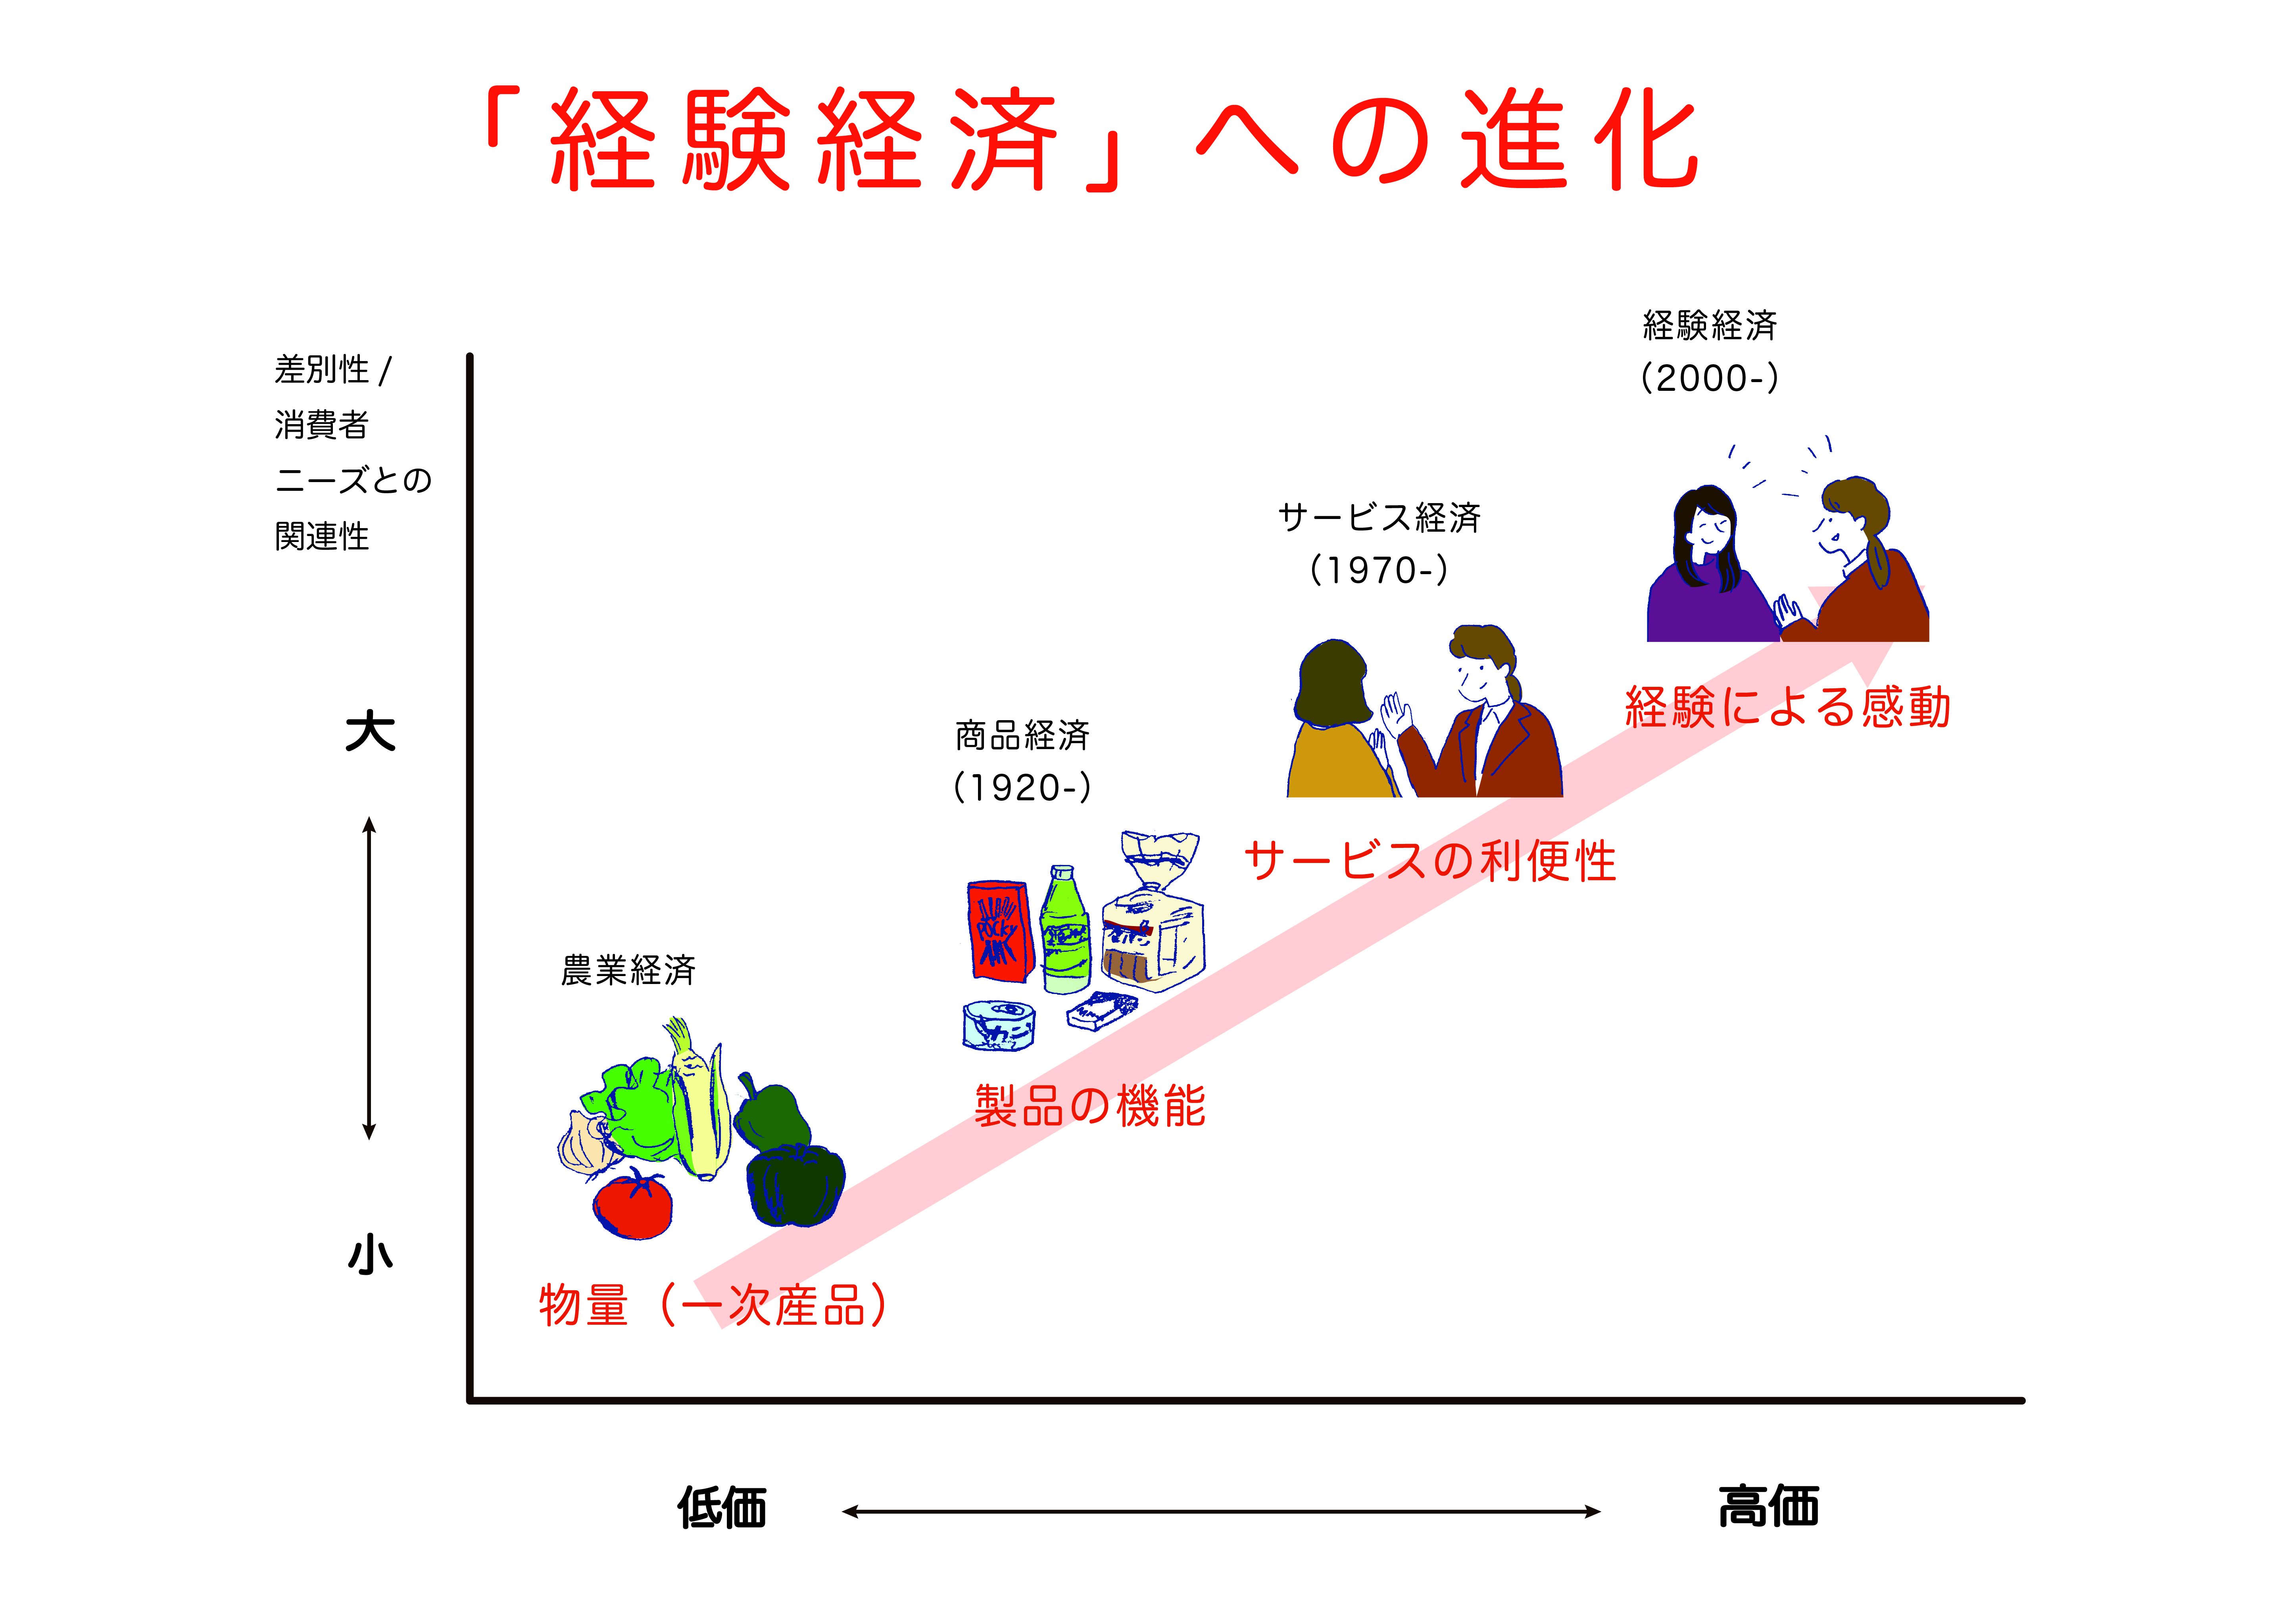 %e5%90%8d%e7%a7%b0%e6%9c%aa%e8%a8%ad%e5%ae%9a-1-02